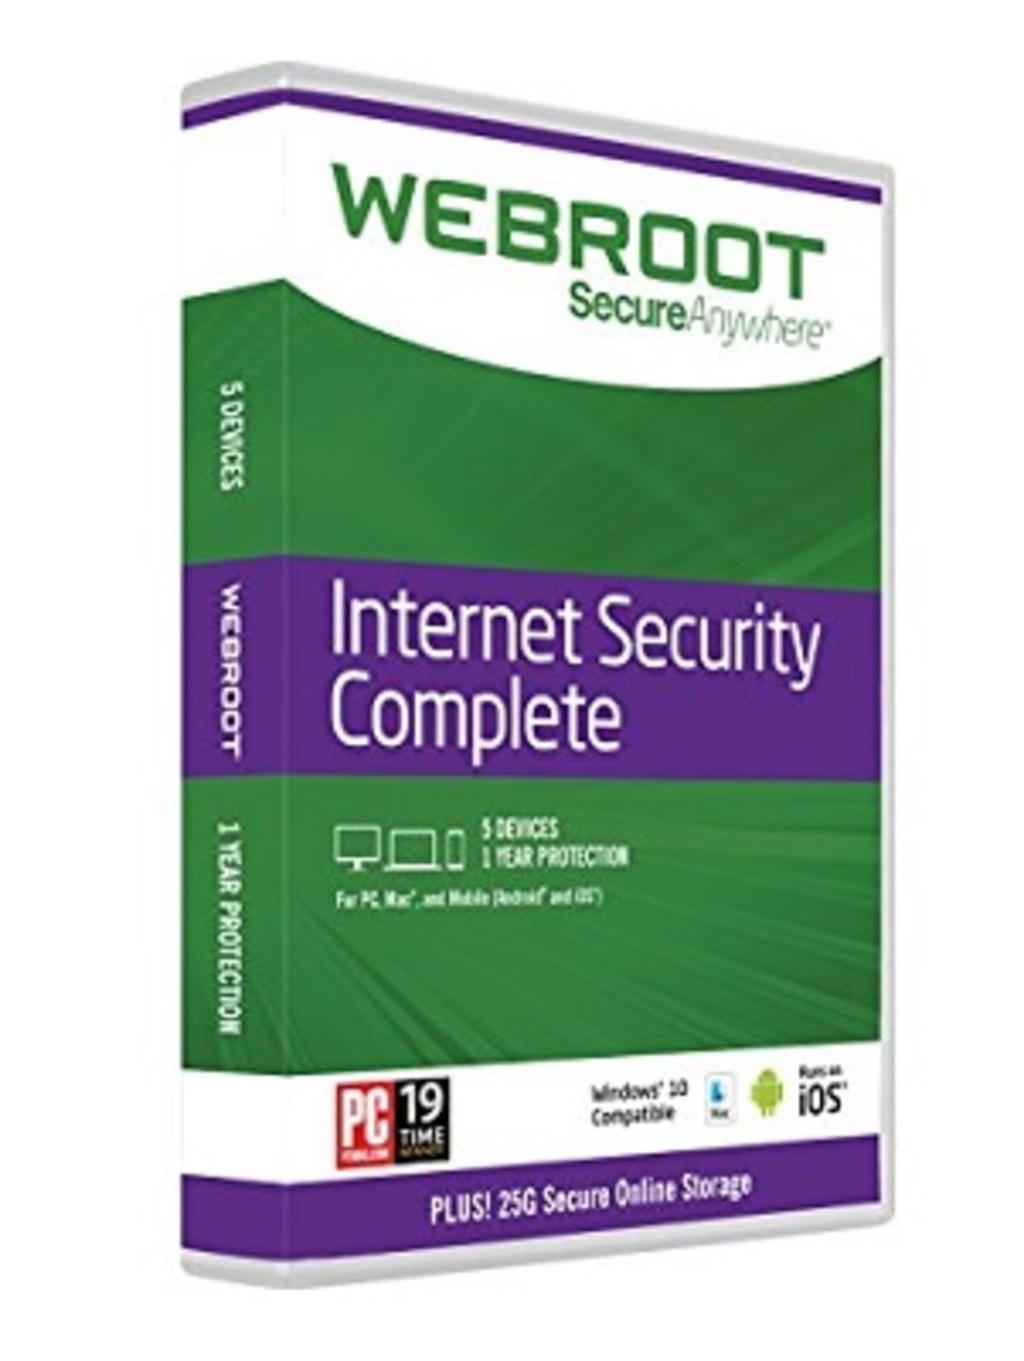 Webroot Products   8444796777   Tek Wire                                         #internetsecurity #... via Tekwire